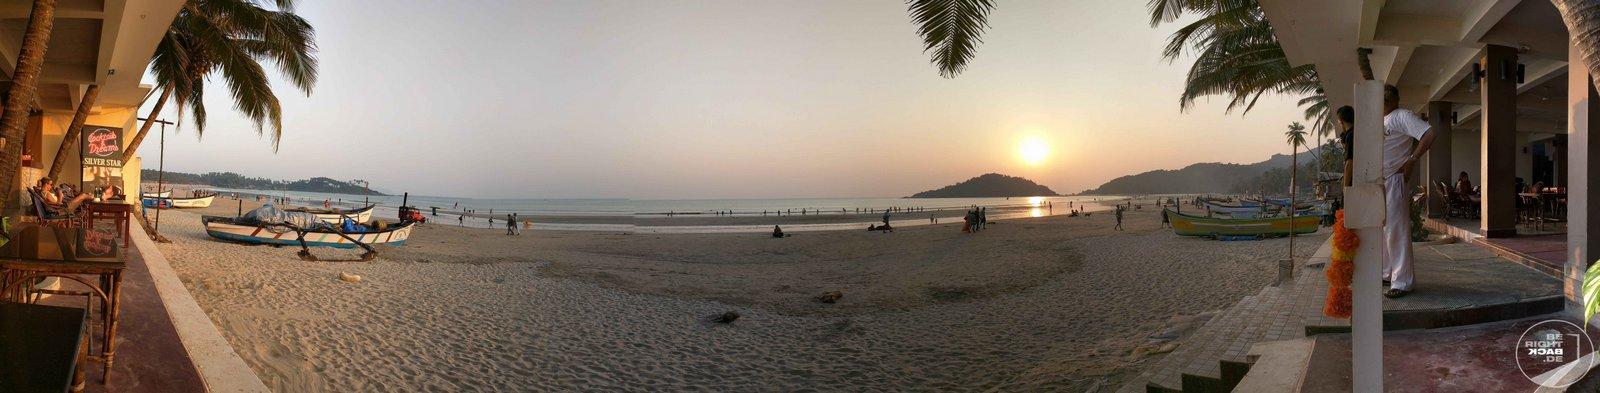 Goa Sonnenuntergang am Strand Panorama